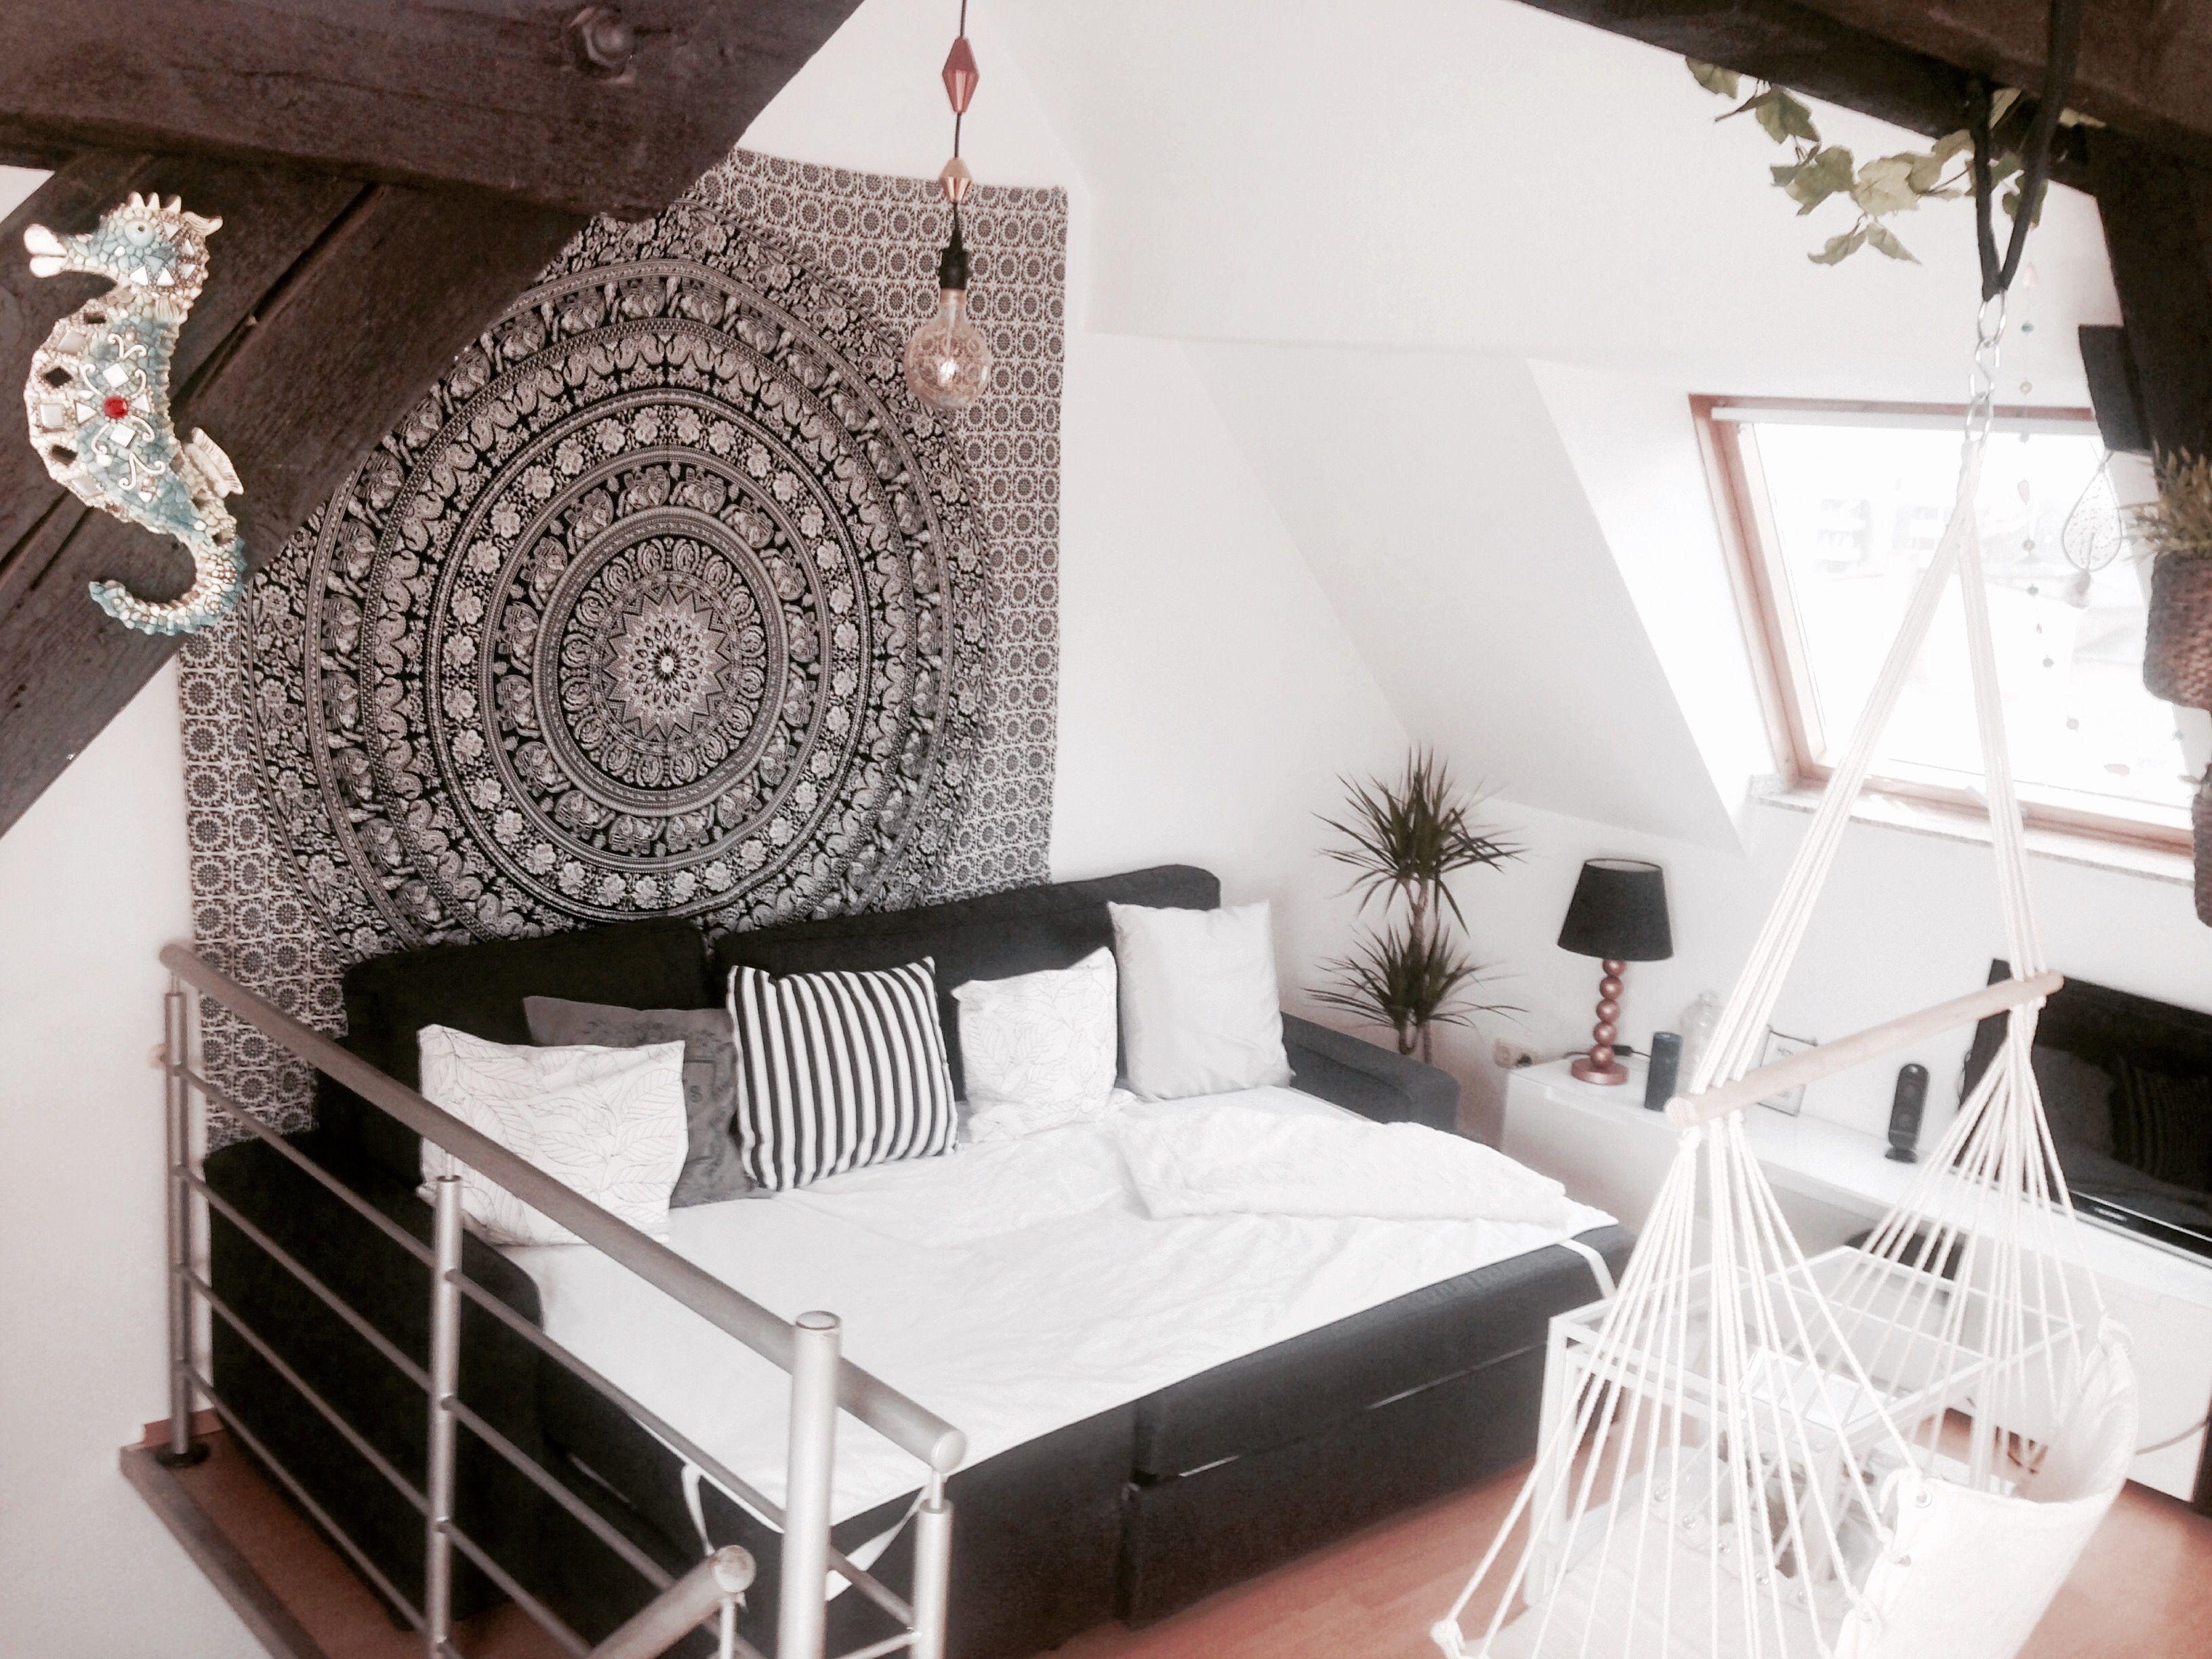 Bohemian Room, Wohnzimmer, Altbau Dachboden